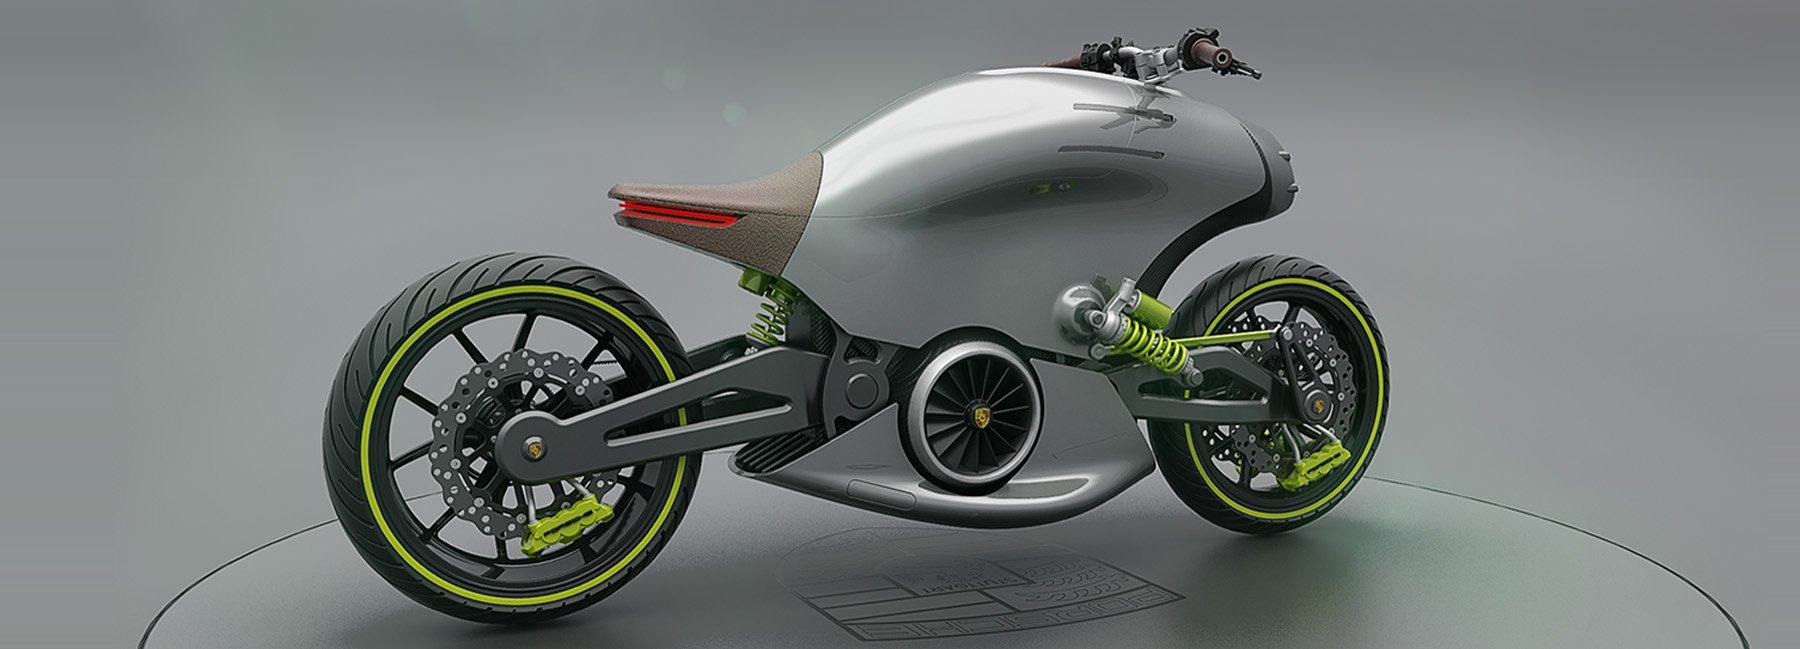 porsche-618-motorcycle-concept-designboom-header1.jpg